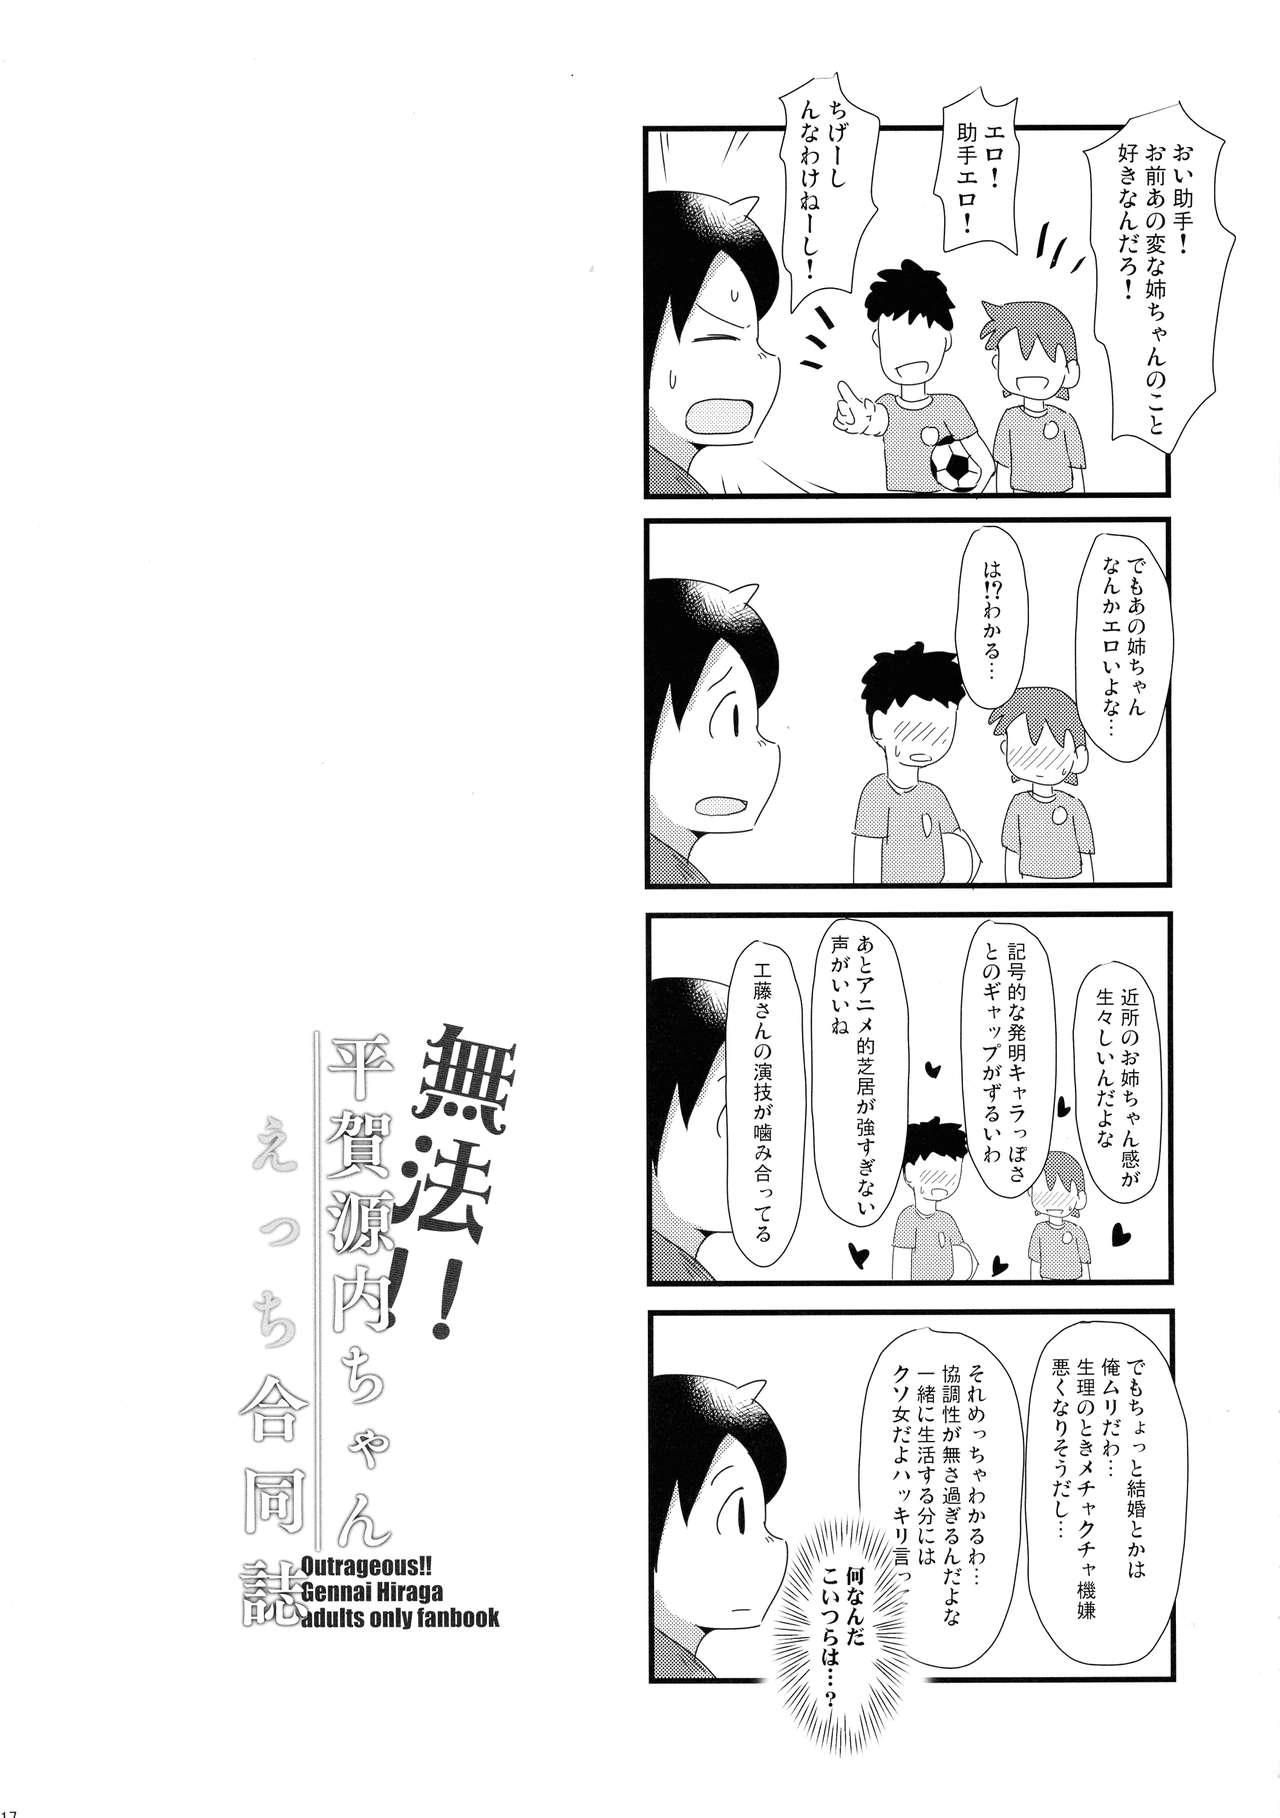 Muhou!! Hiraga Gennai-chan Ecchi Goudoushi 16